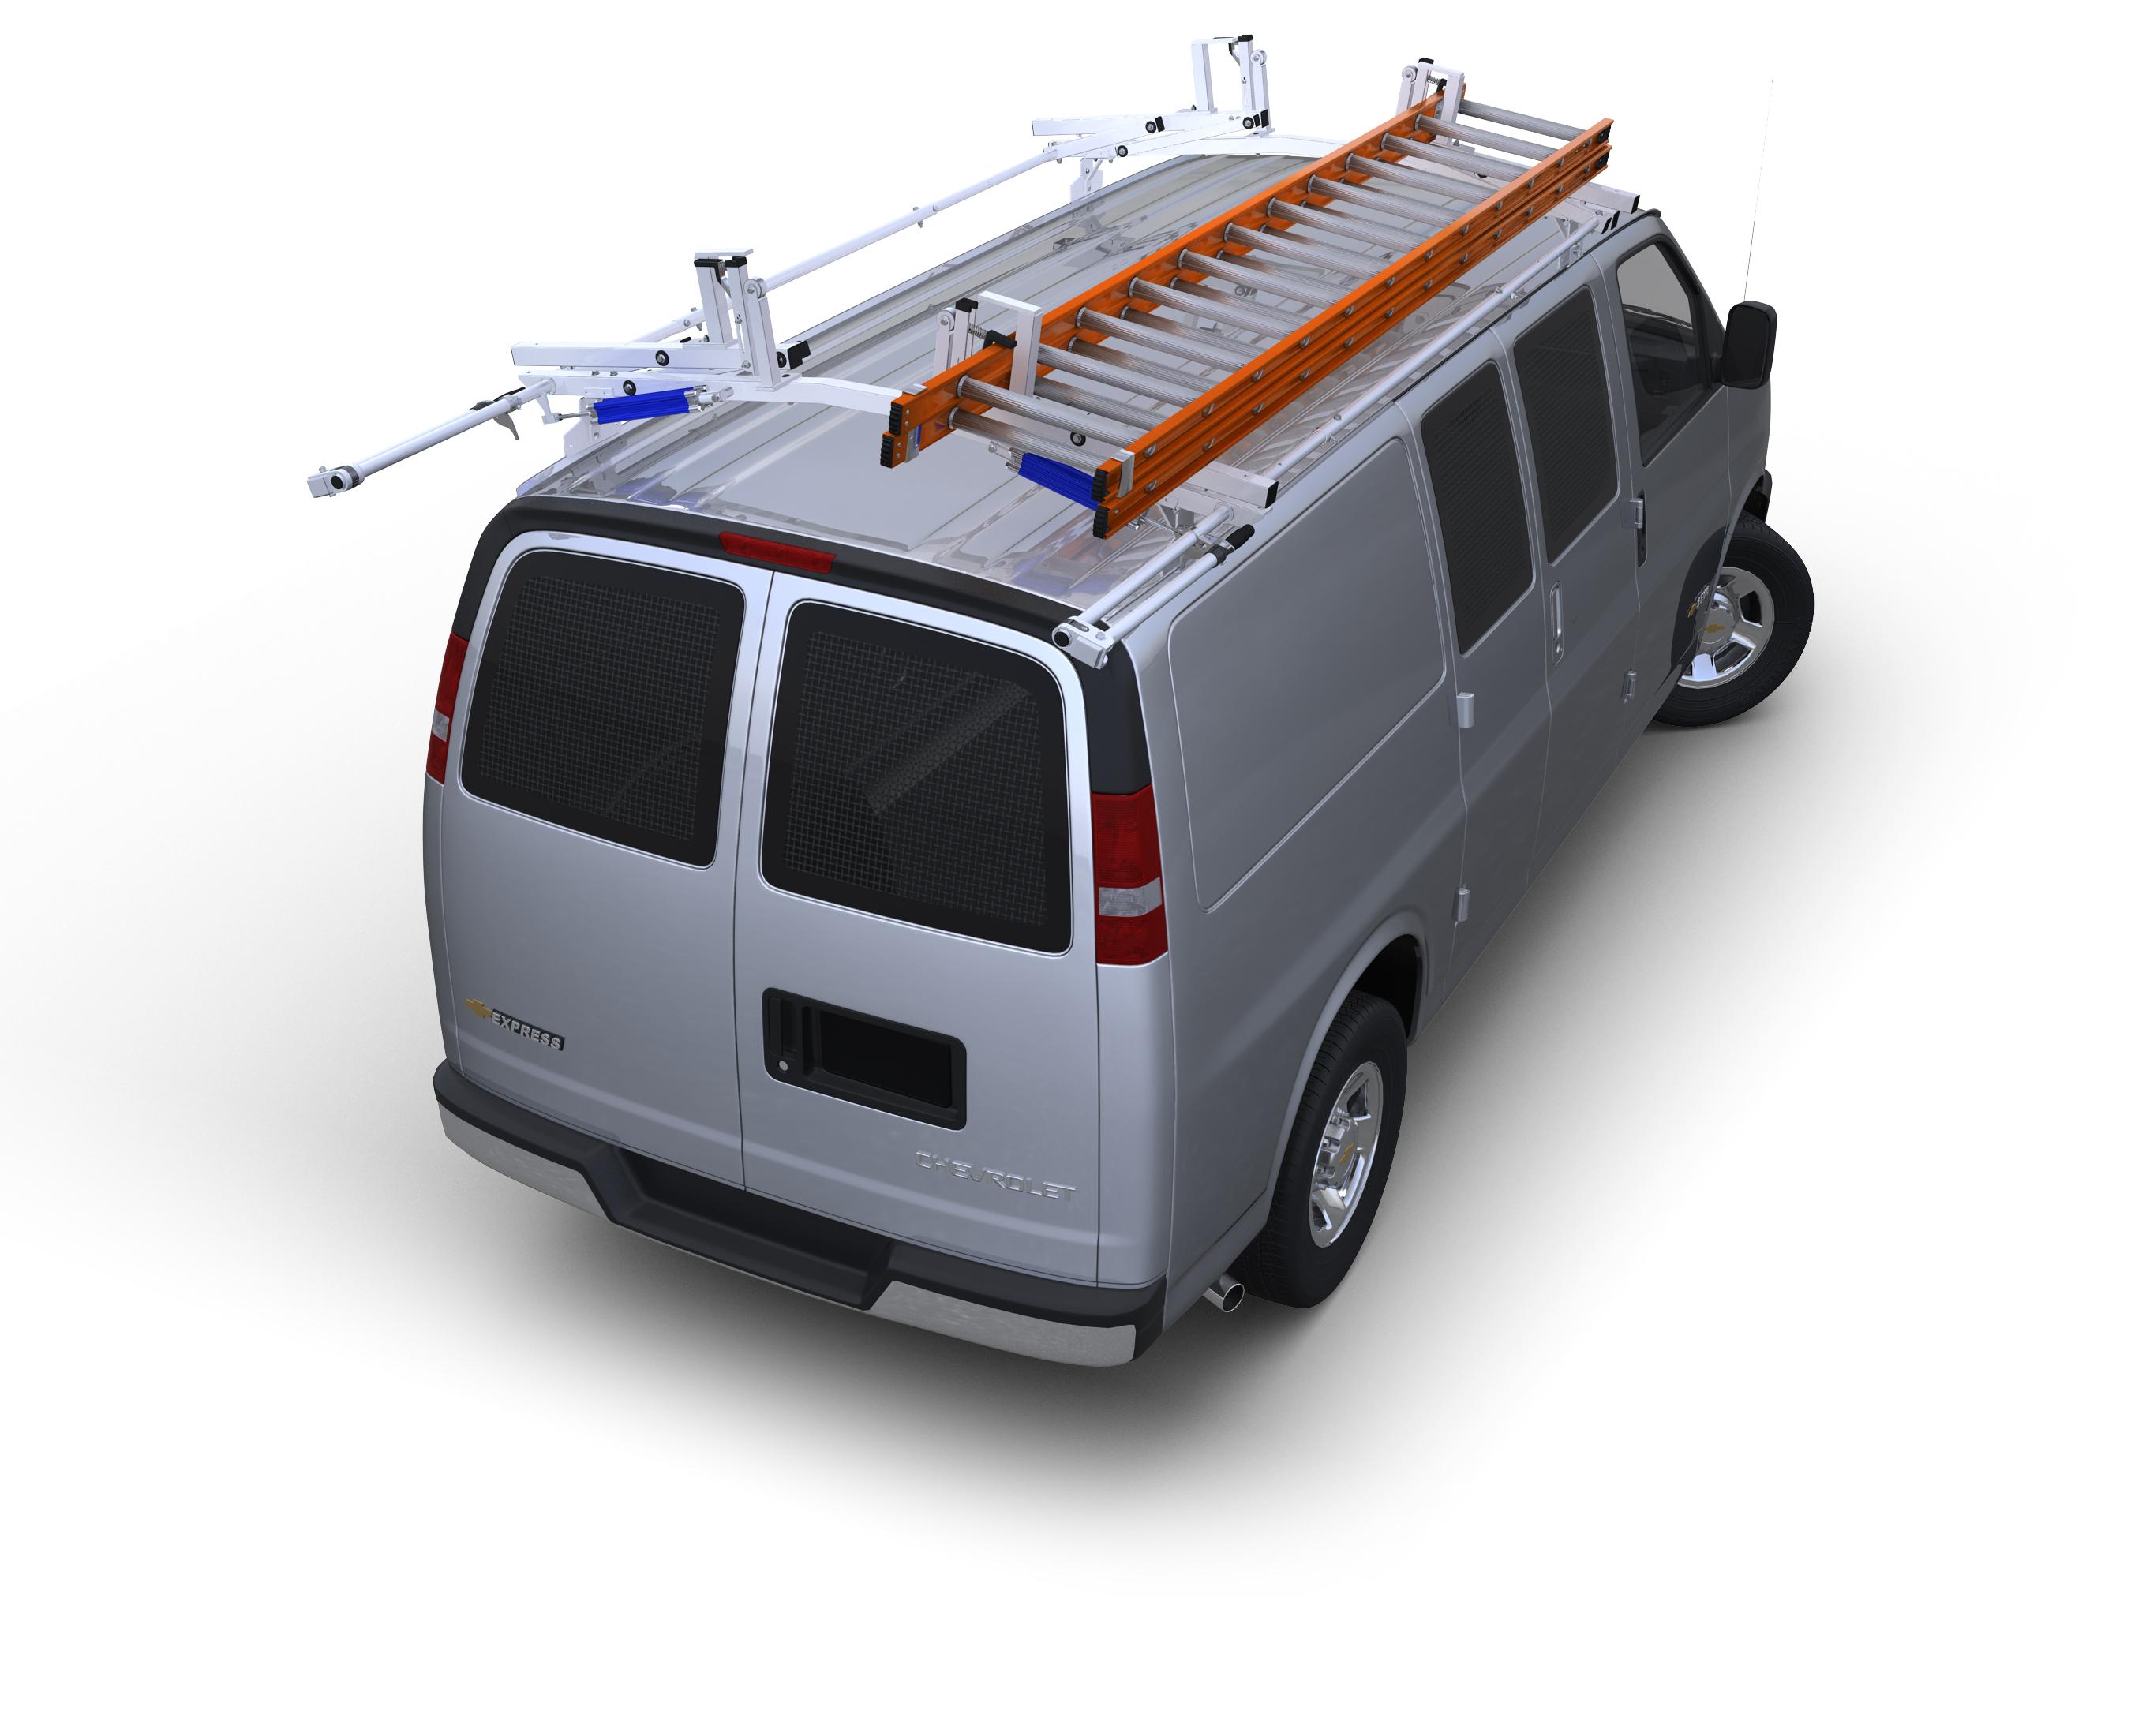 Nissan NV High Roof Aluminum Side Access Rotation Rack - Curb Side